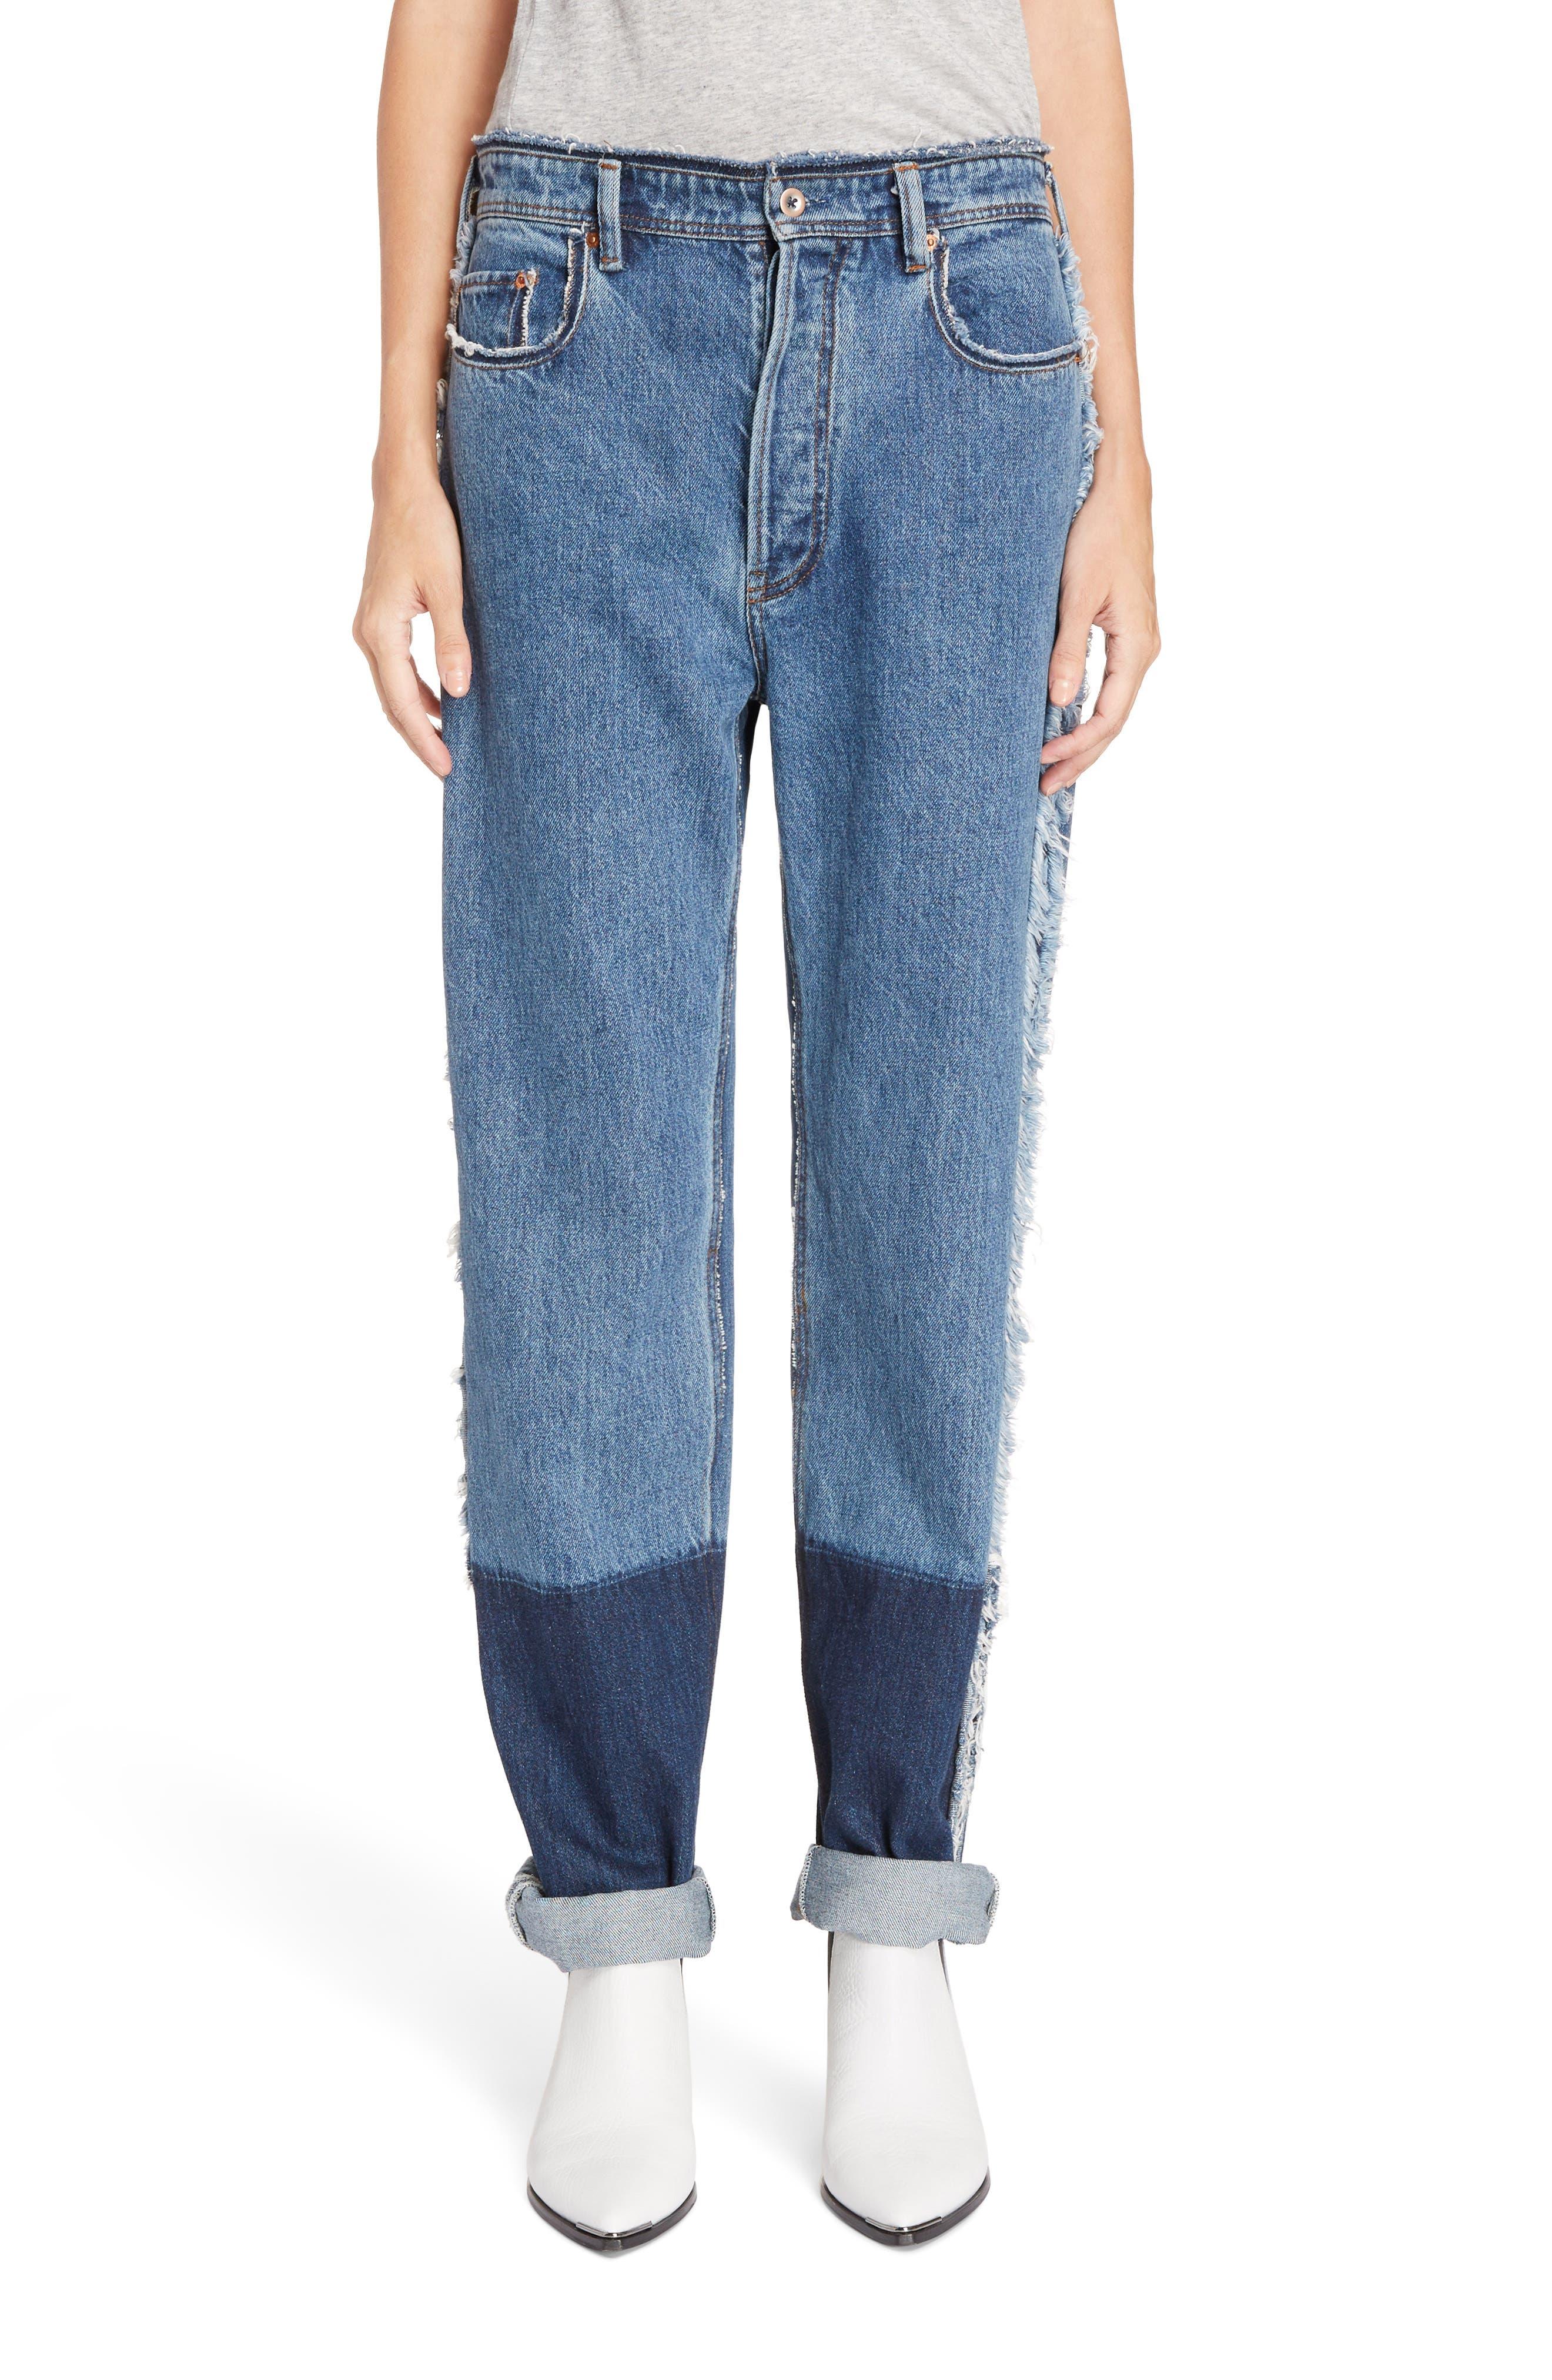 Mirja Frayed High Waist Straight Leg Jeans,                             Main thumbnail 1, color,                             Indigo Blue